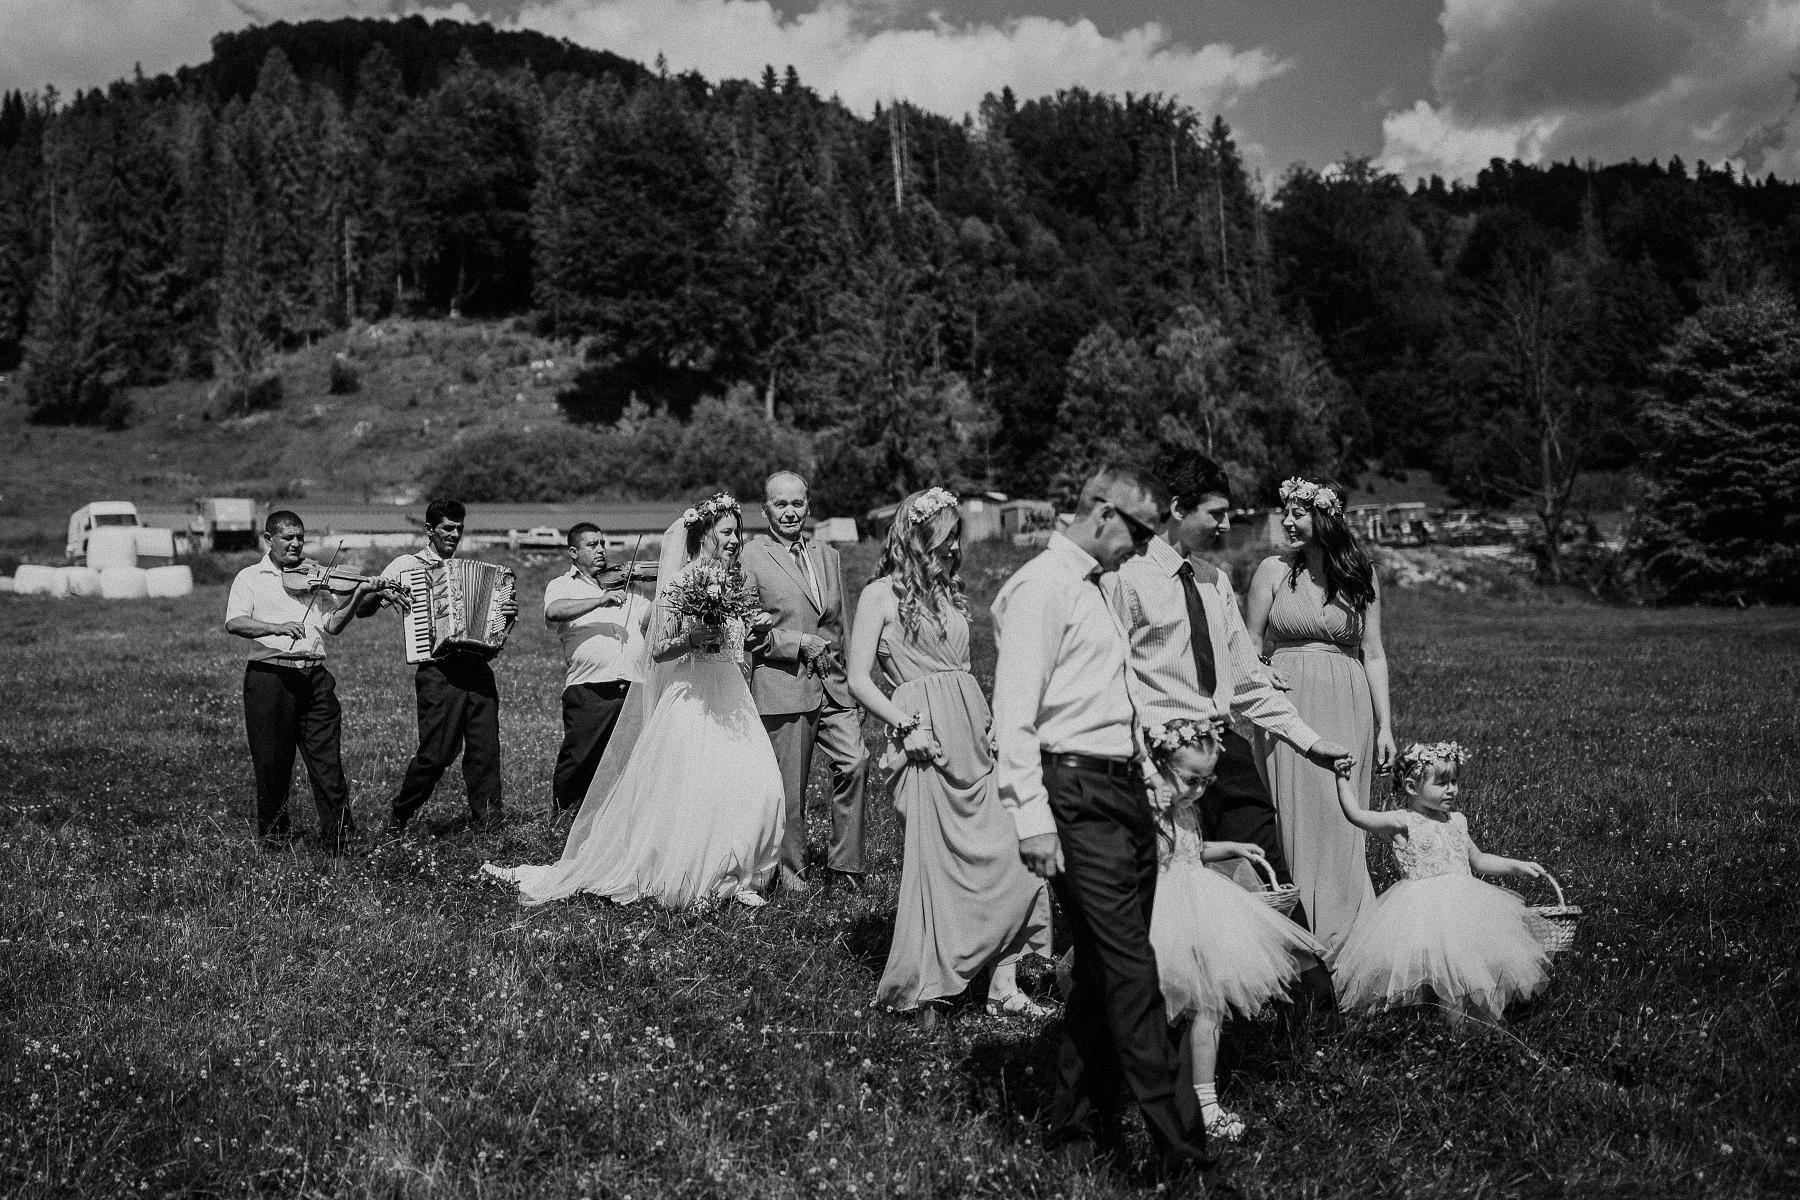 fotograf lubos krahulec, svadobny fotograf, slovensko, tatry,  fotograf vychod, presov, kosice, poprad, michalovce, bardejov, kameraman,  najlepsie svadobne fotky